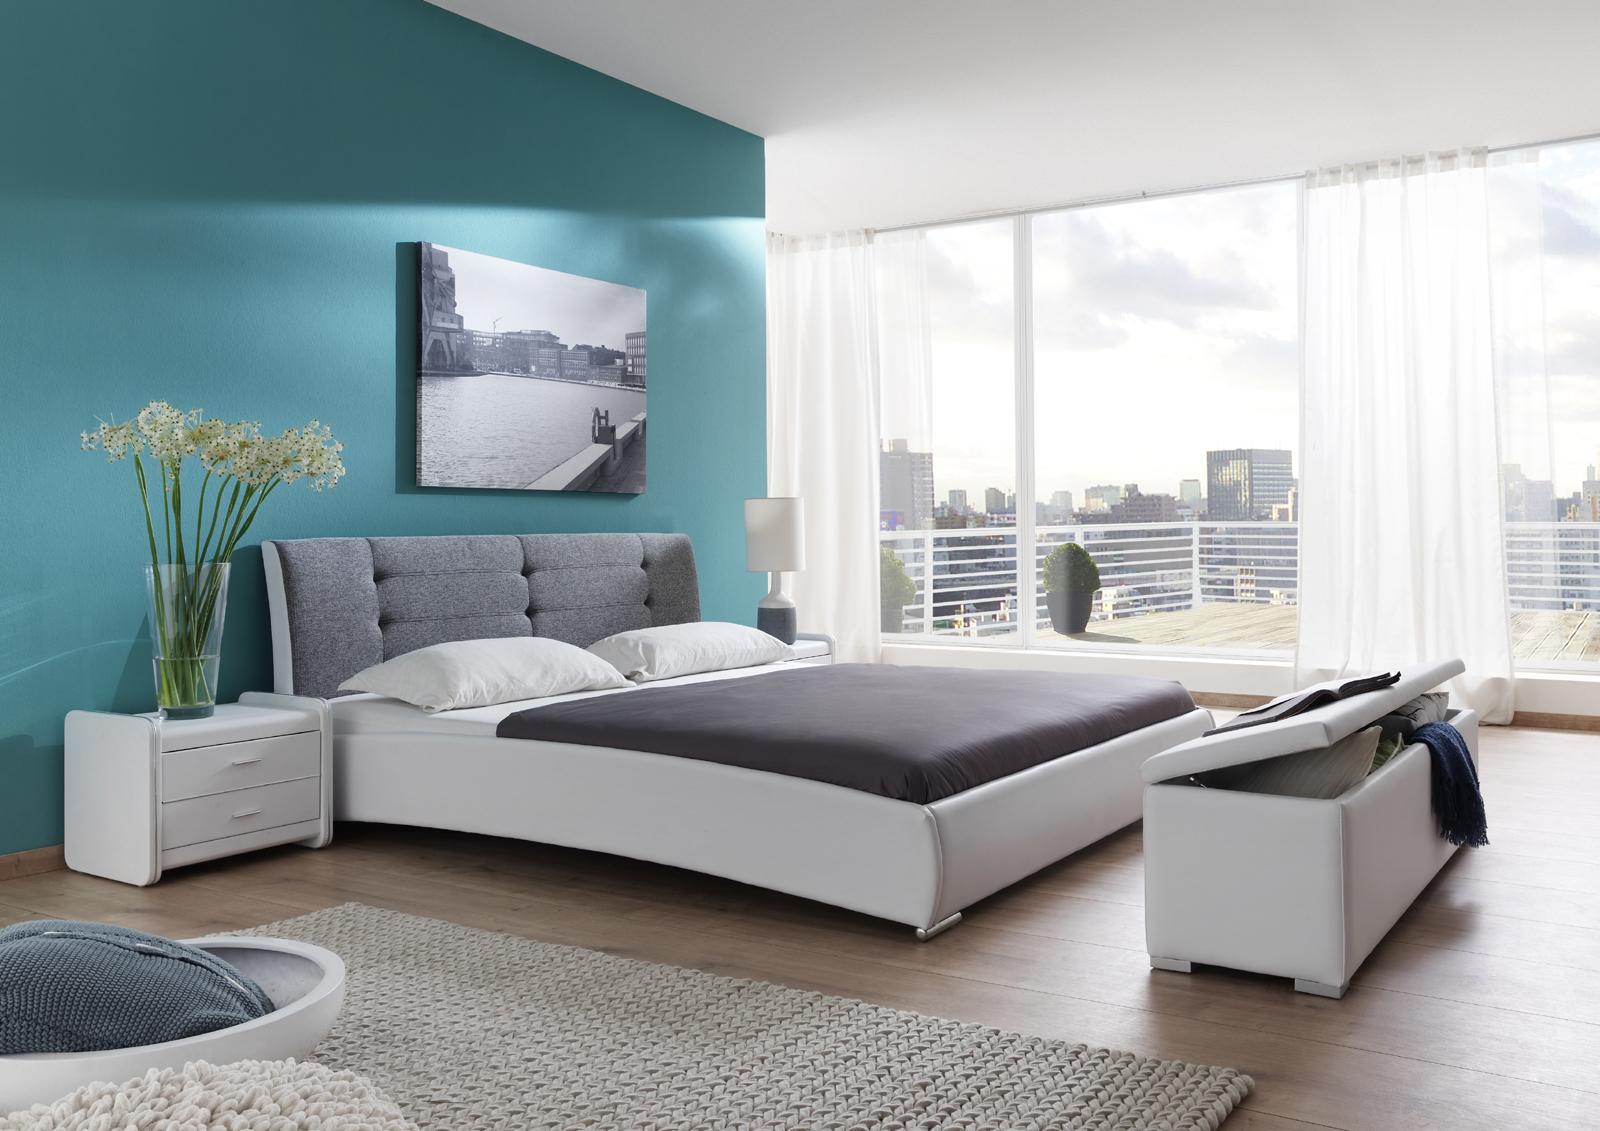 sam design polsterbett 140 x 200 cm wei grau bebop. Black Bedroom Furniture Sets. Home Design Ideas